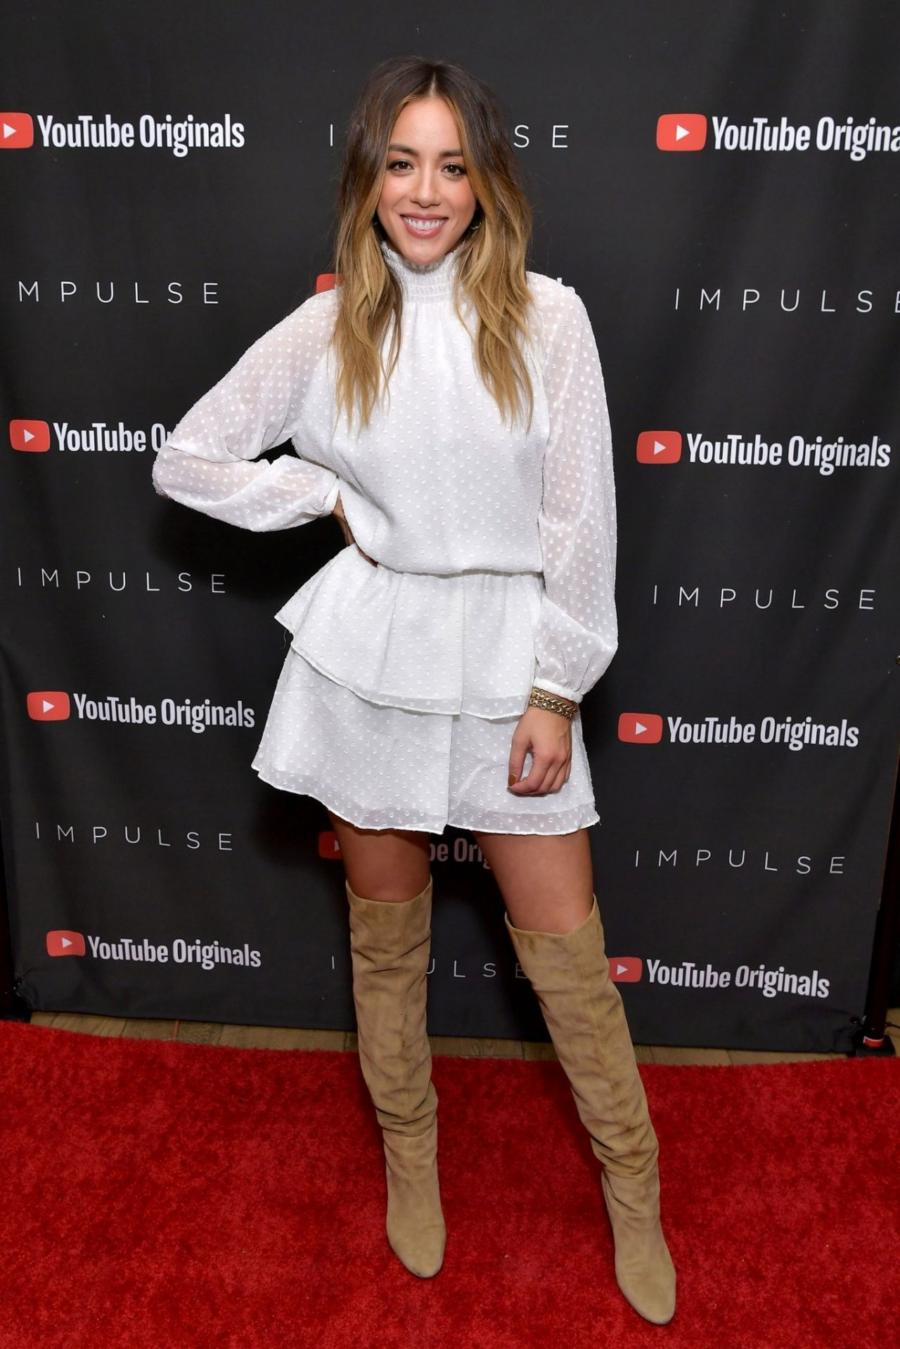 Chloe Bennet Impulse Season 2 Special Screening in West Hollywood